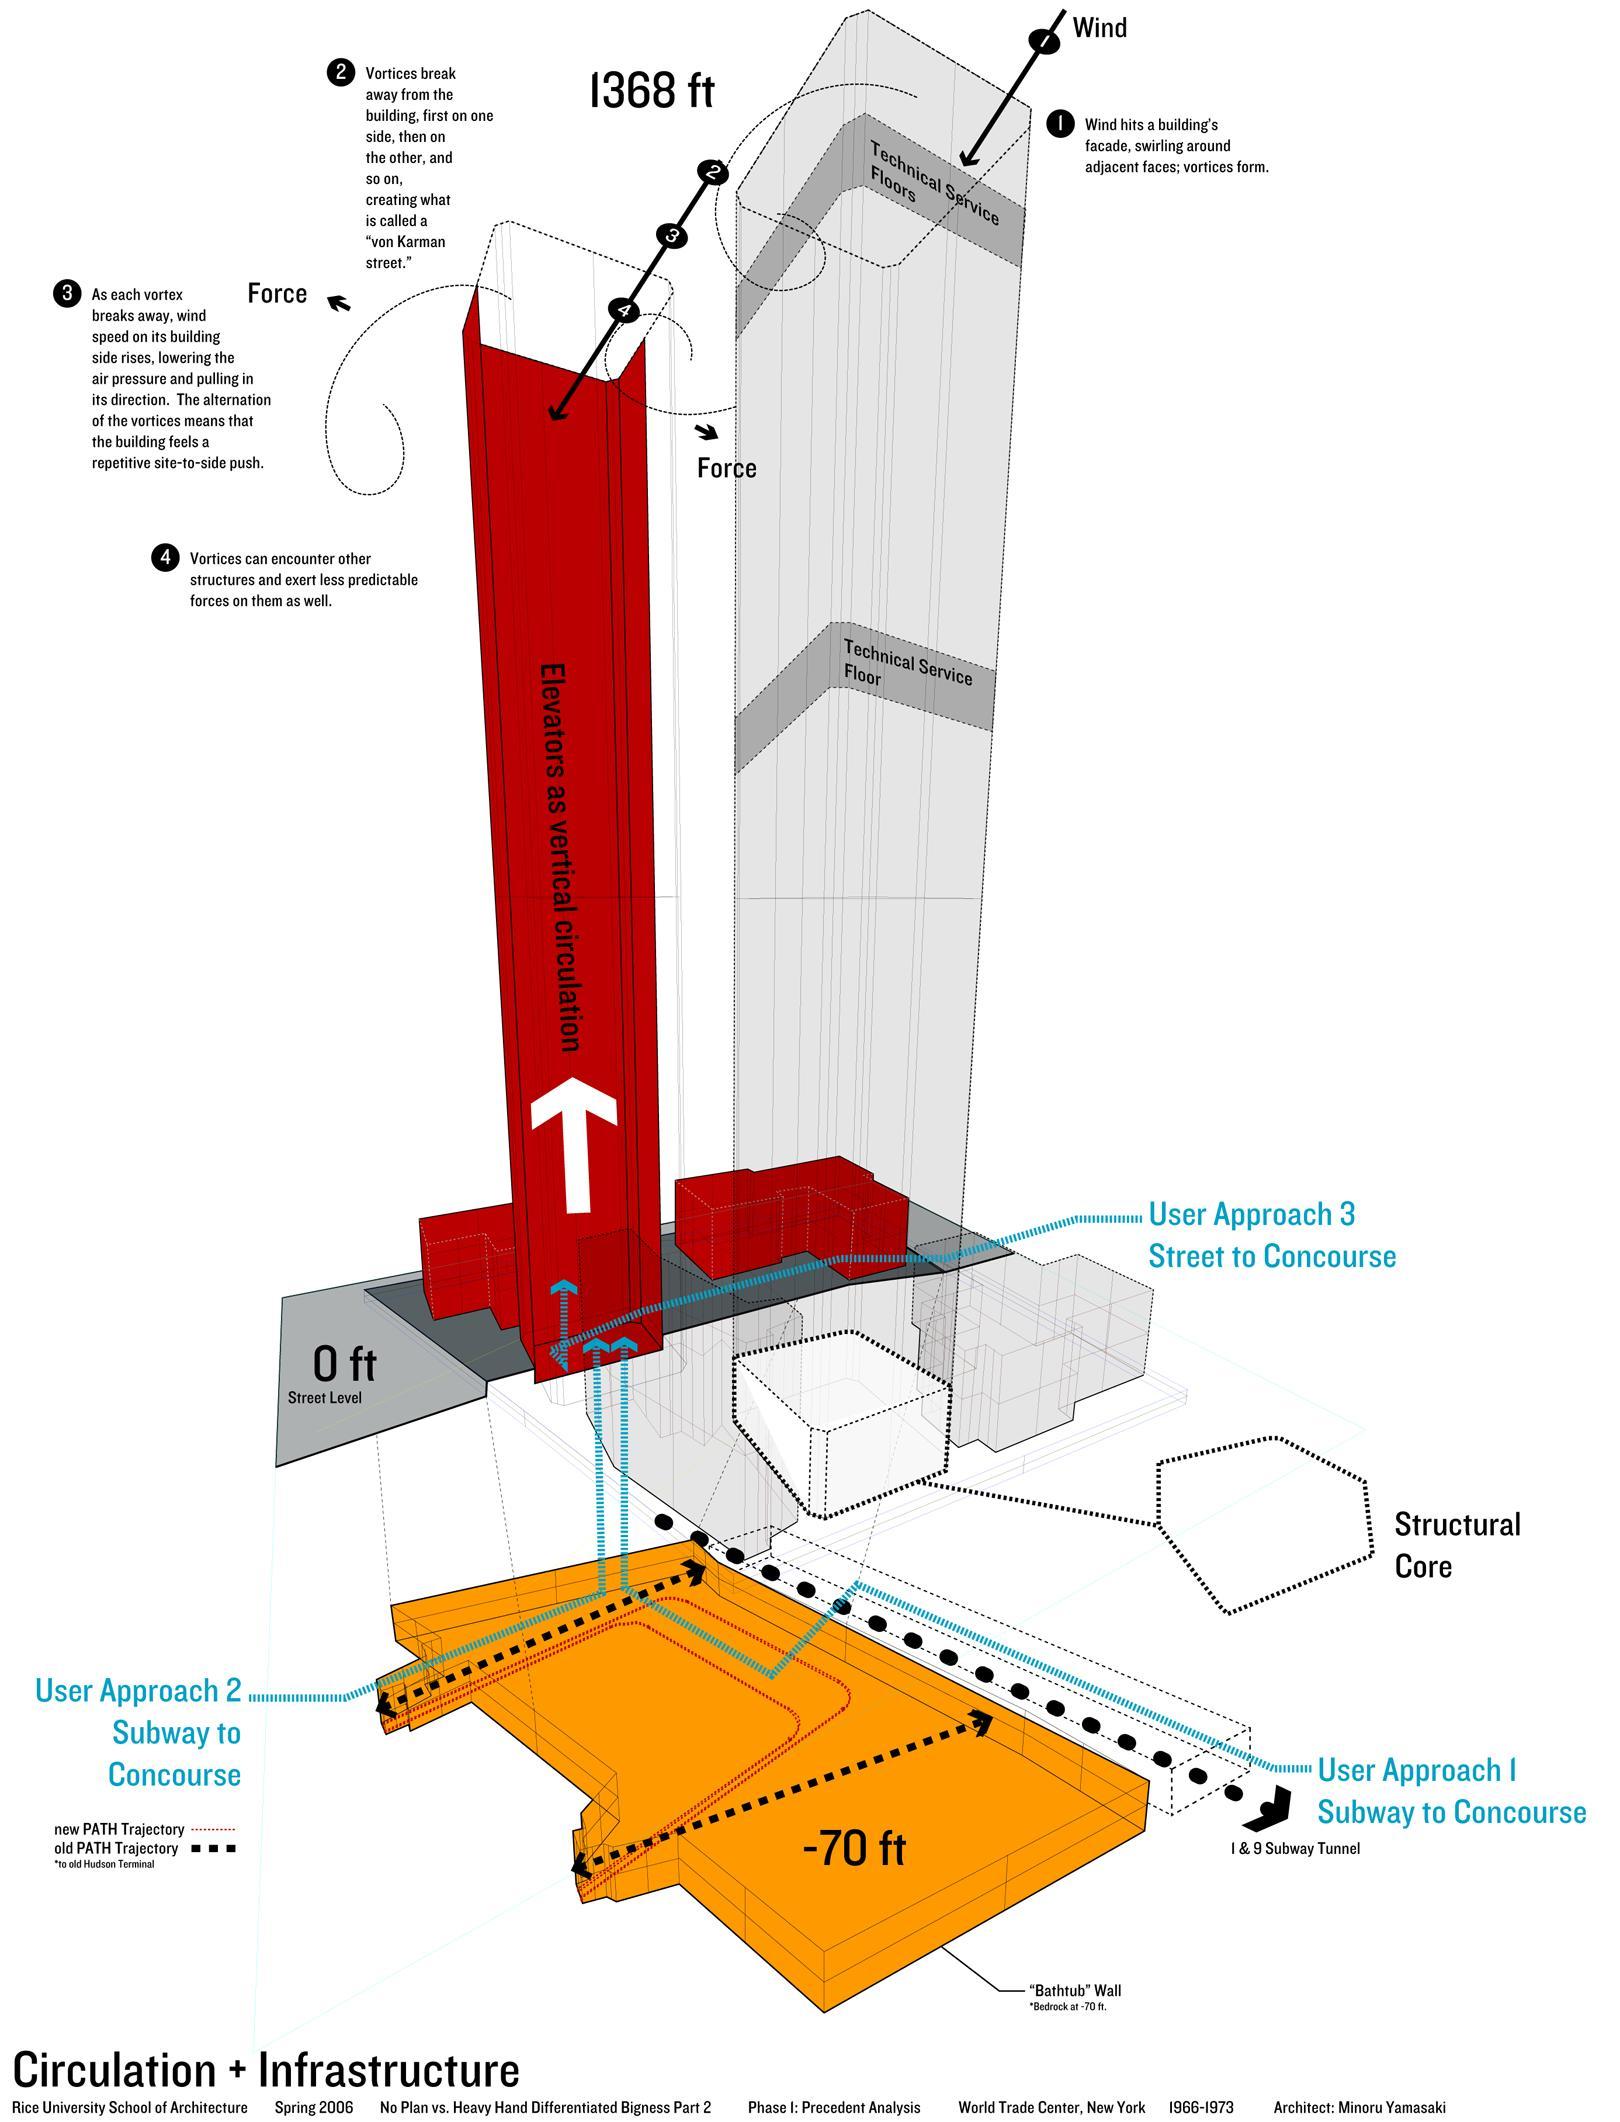 Infrastructural Diagram